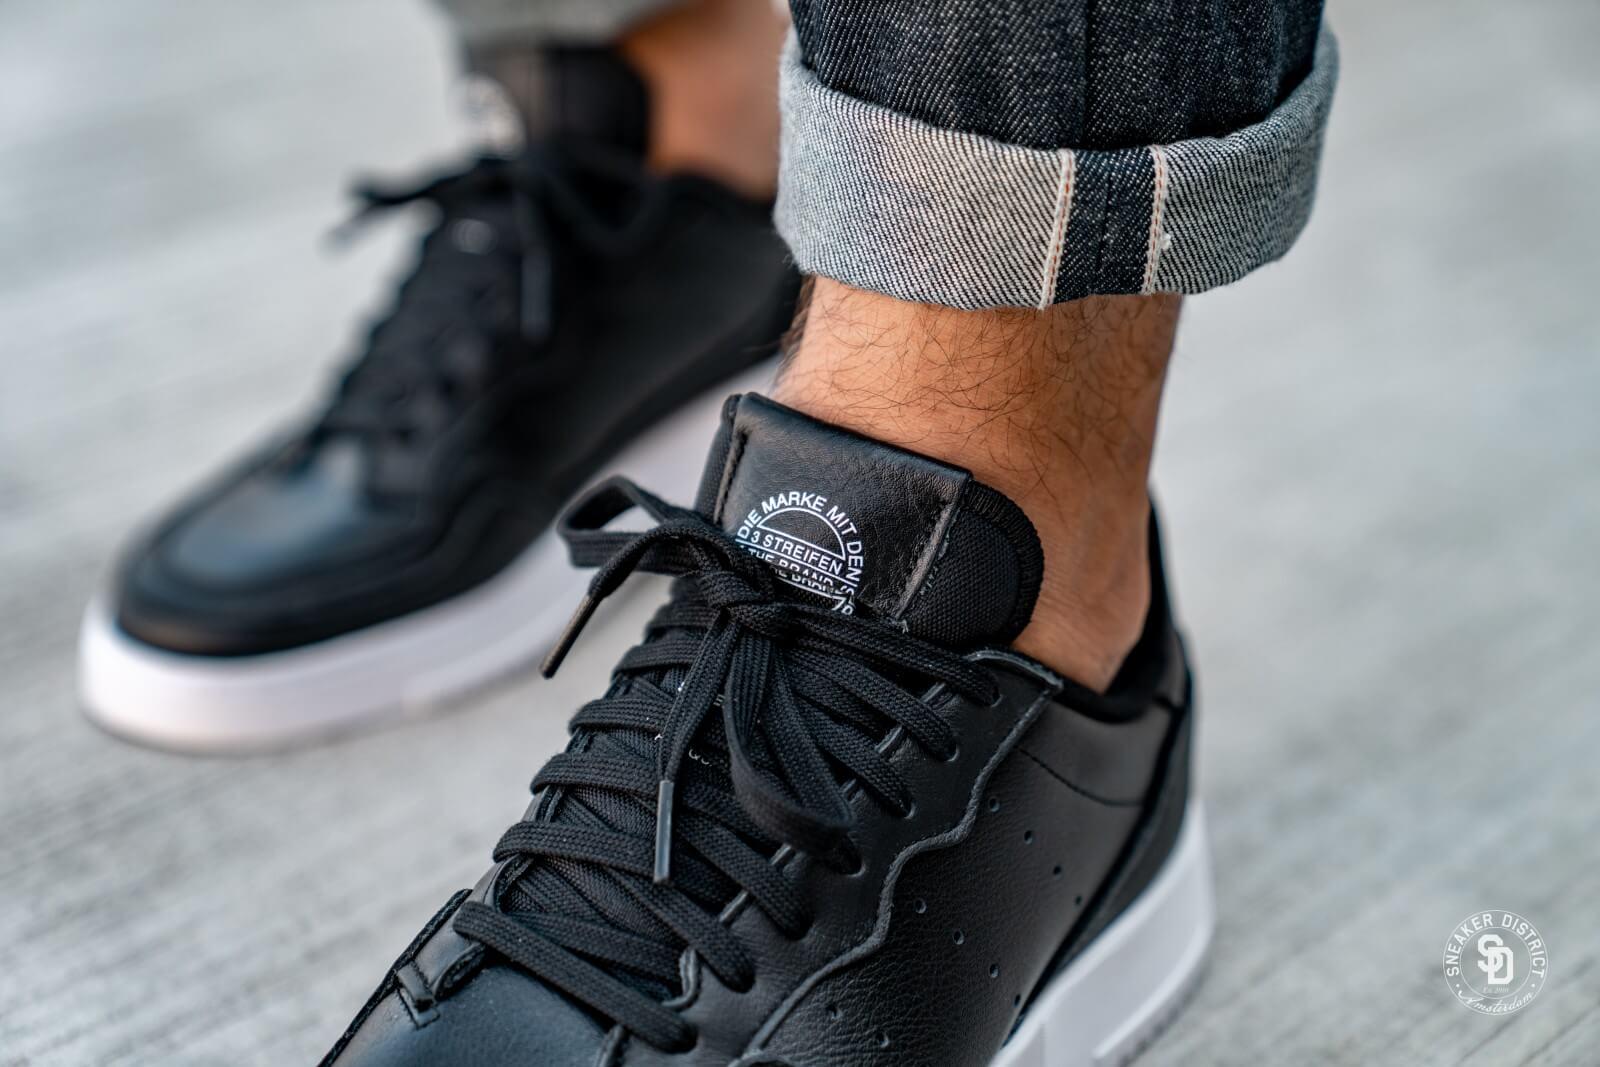 Adidas Supercourt Core Black/Footwear White